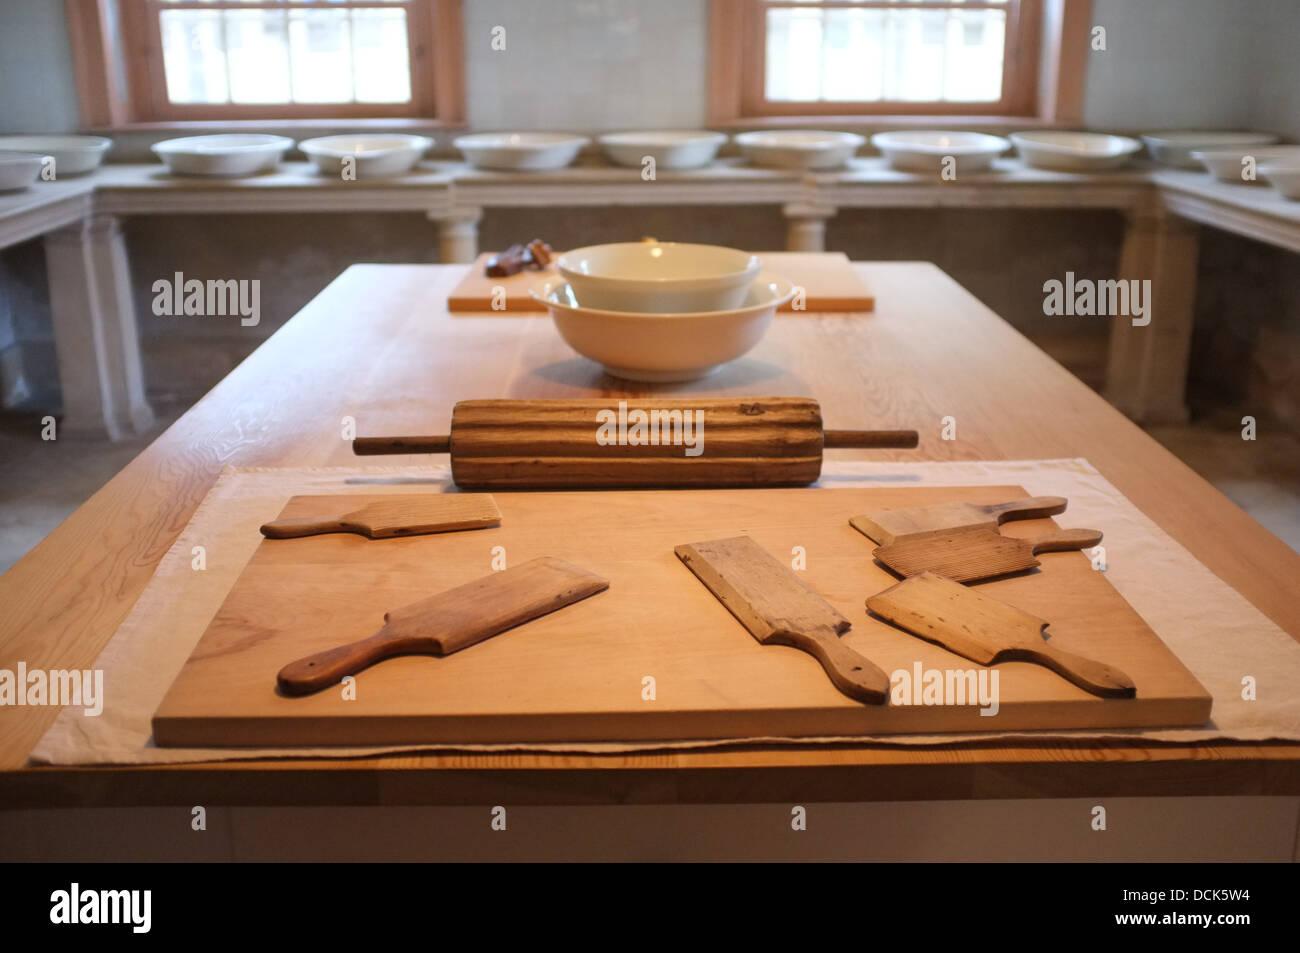 Victorian cheese & butter kitchen utensils - Stock Image